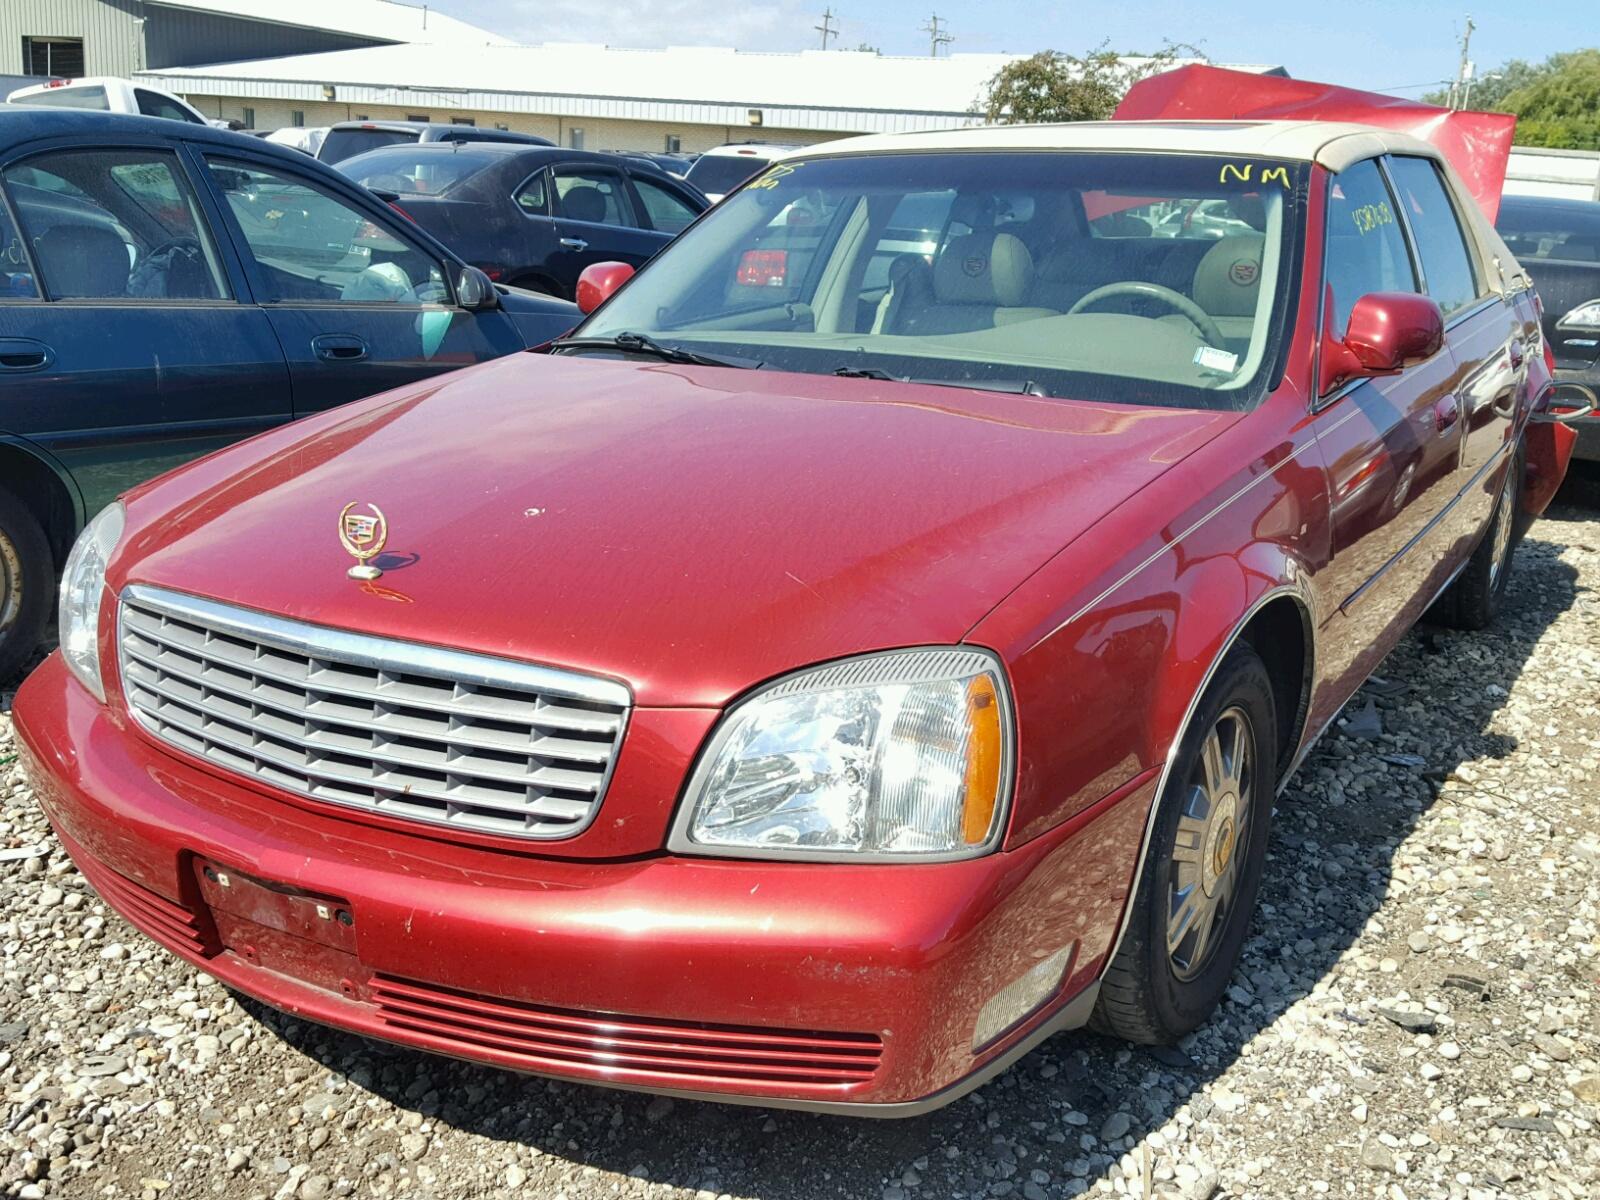 1g6kd54y35u213053 2005 Red Cadillac Deville On Sale In Wi